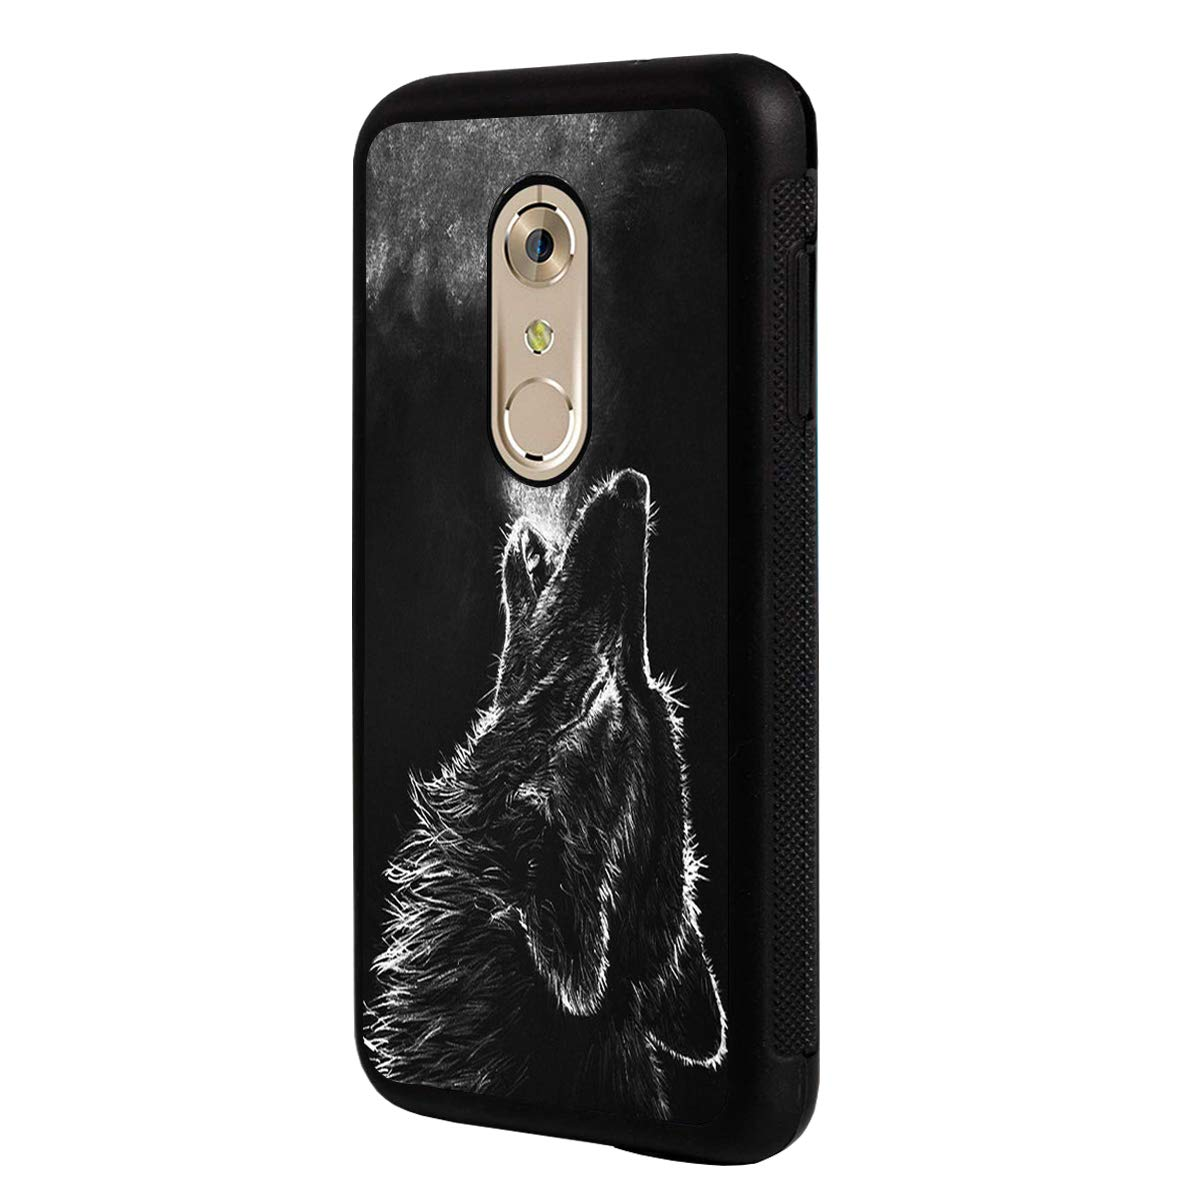 LG Q7 Case,LG Q7 Plus Case,BOSLIVE Grey Wolf Howling Background Design TPU Slim Anti-Scratch Protective Cover Case for LG Q7 /LG Q7 Plus